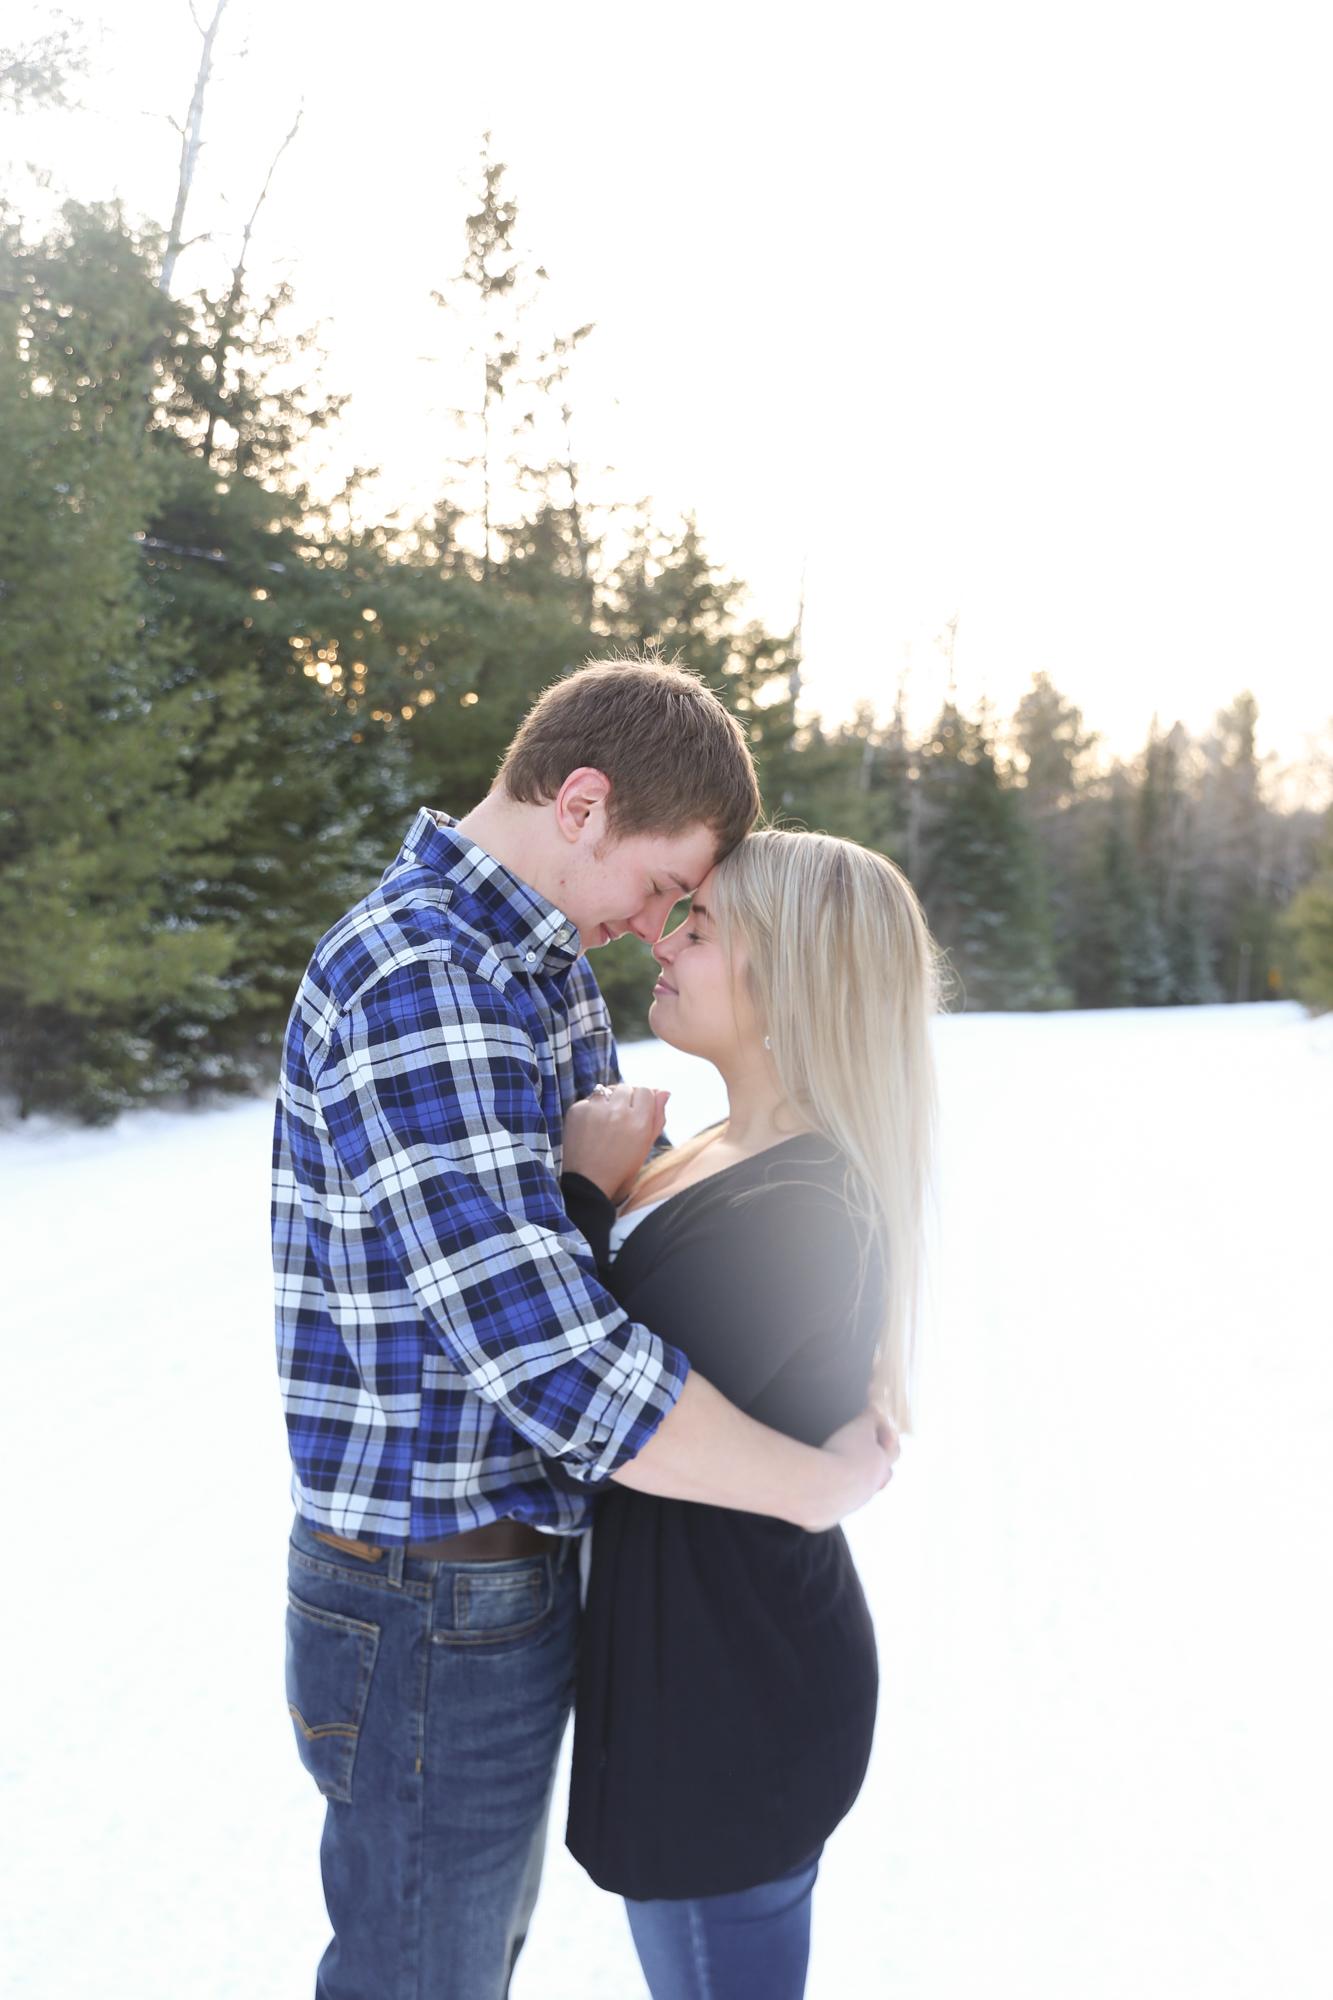 Brillion Wisconsin Wedding Photographer - Whit Meza Photography